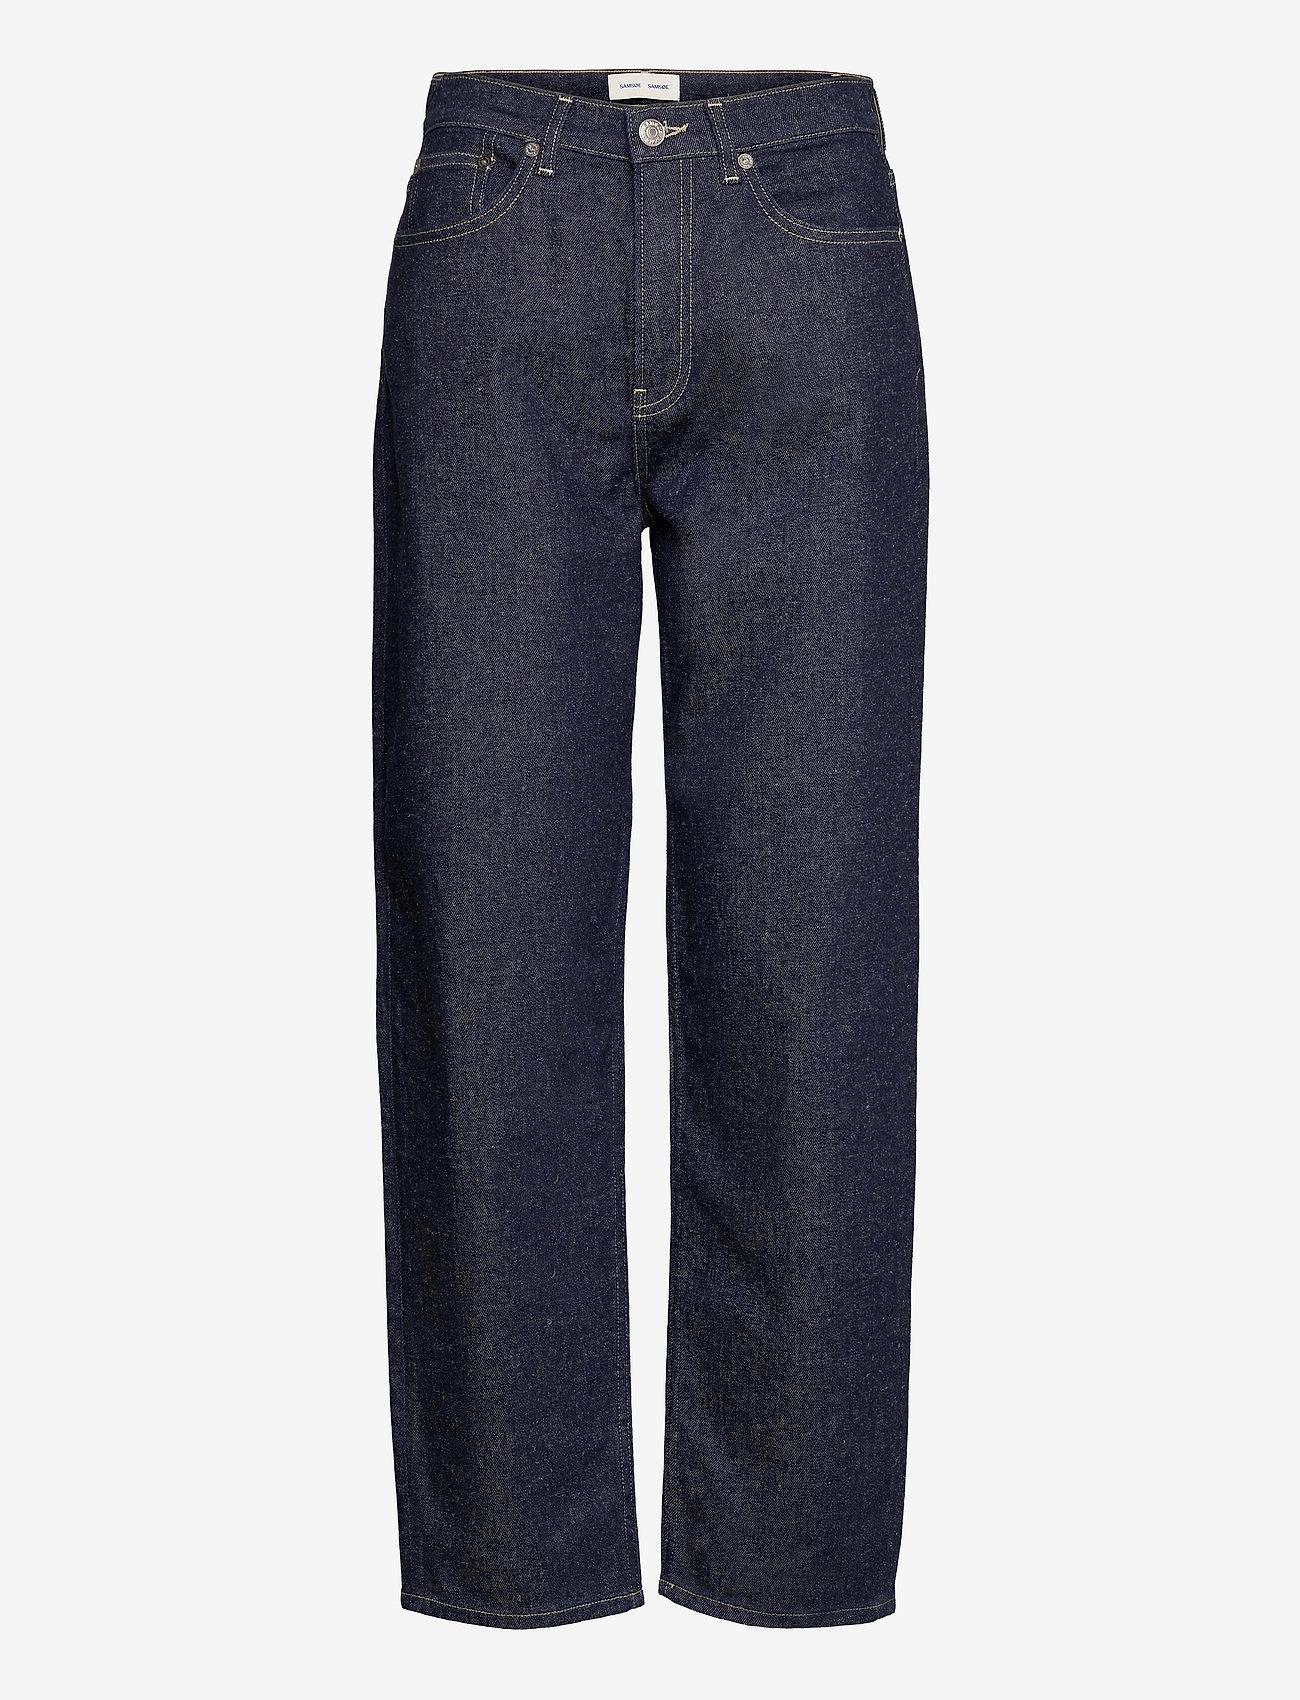 Samsøe Samsøe - Elly jeans 14031 - straight regular - blue rinse - 1